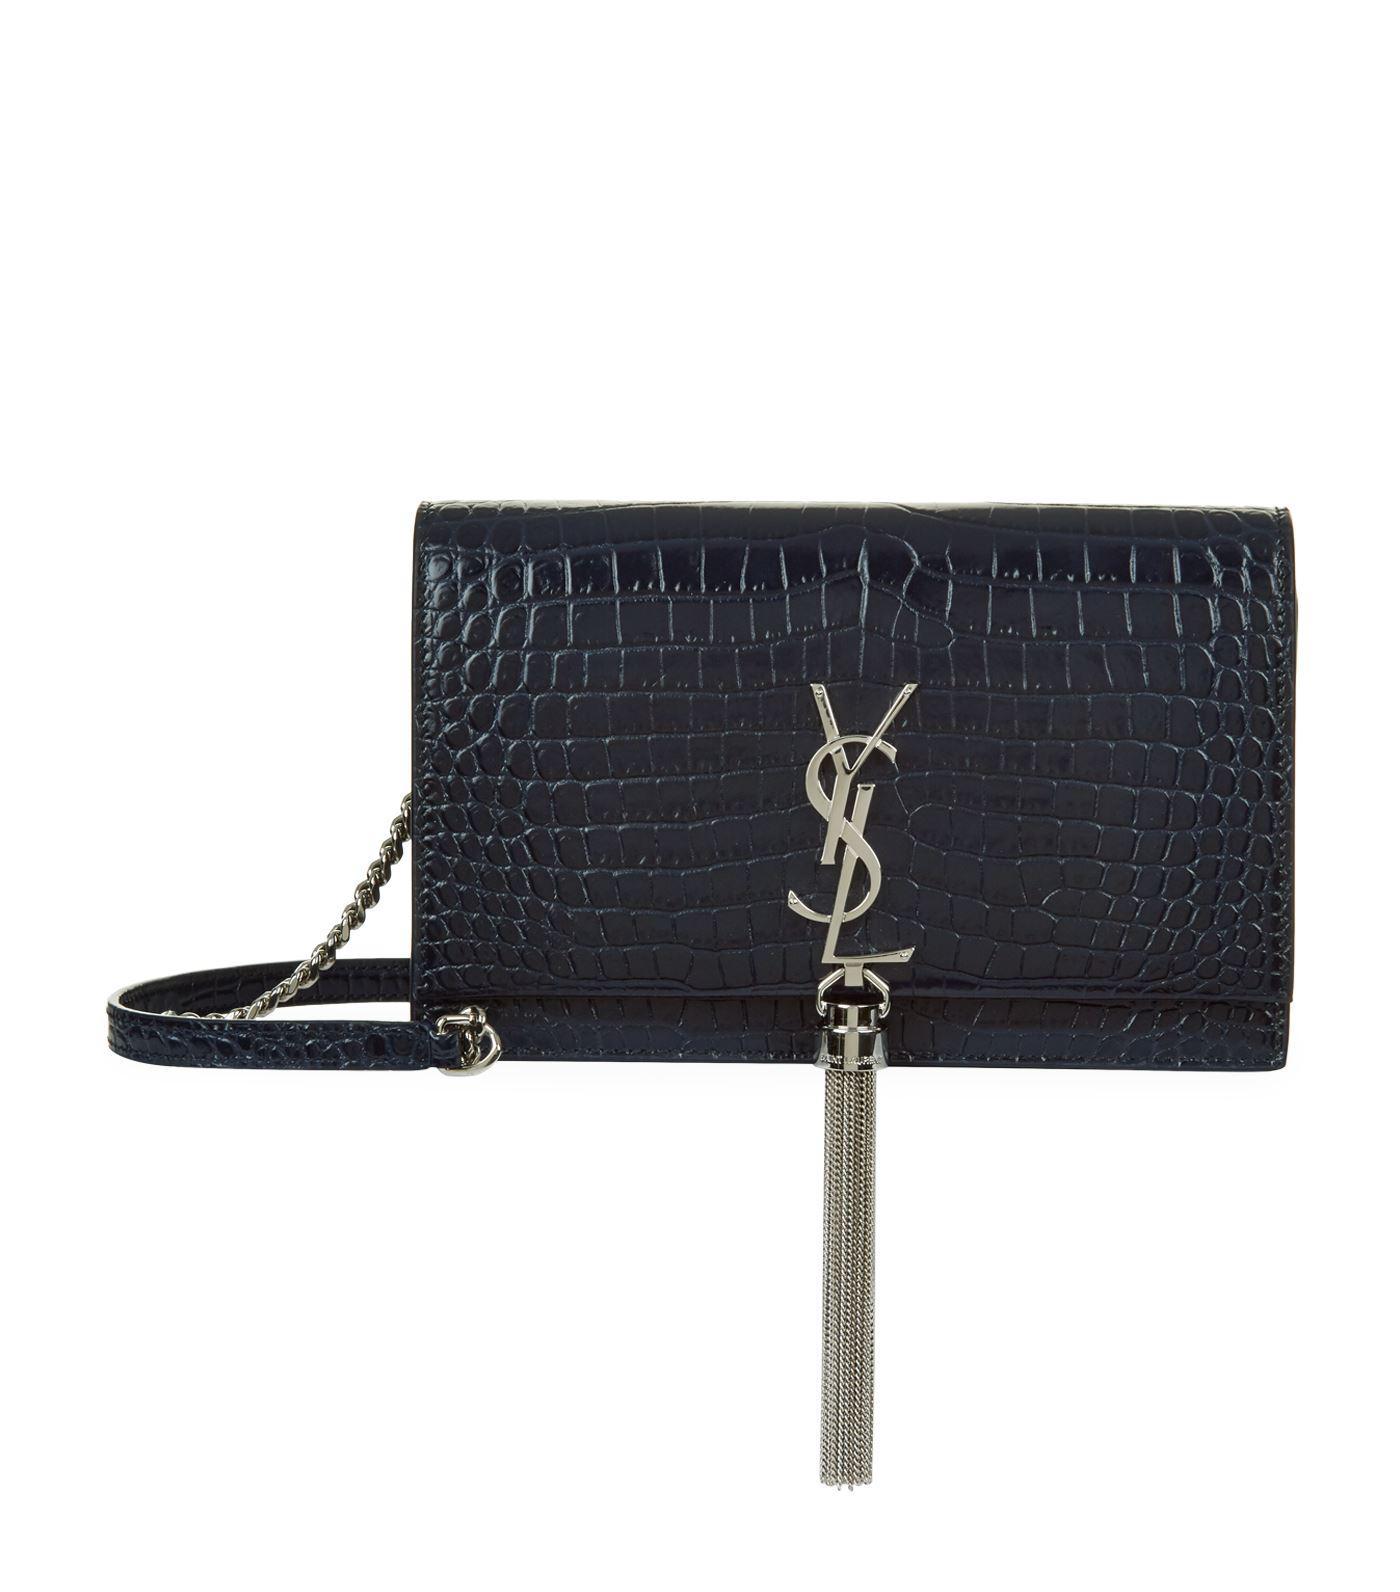 7131e8f2759 Saint Laurent Mini Croc-embossed Kate Tassel Shoulder Bag in Blue - Lyst